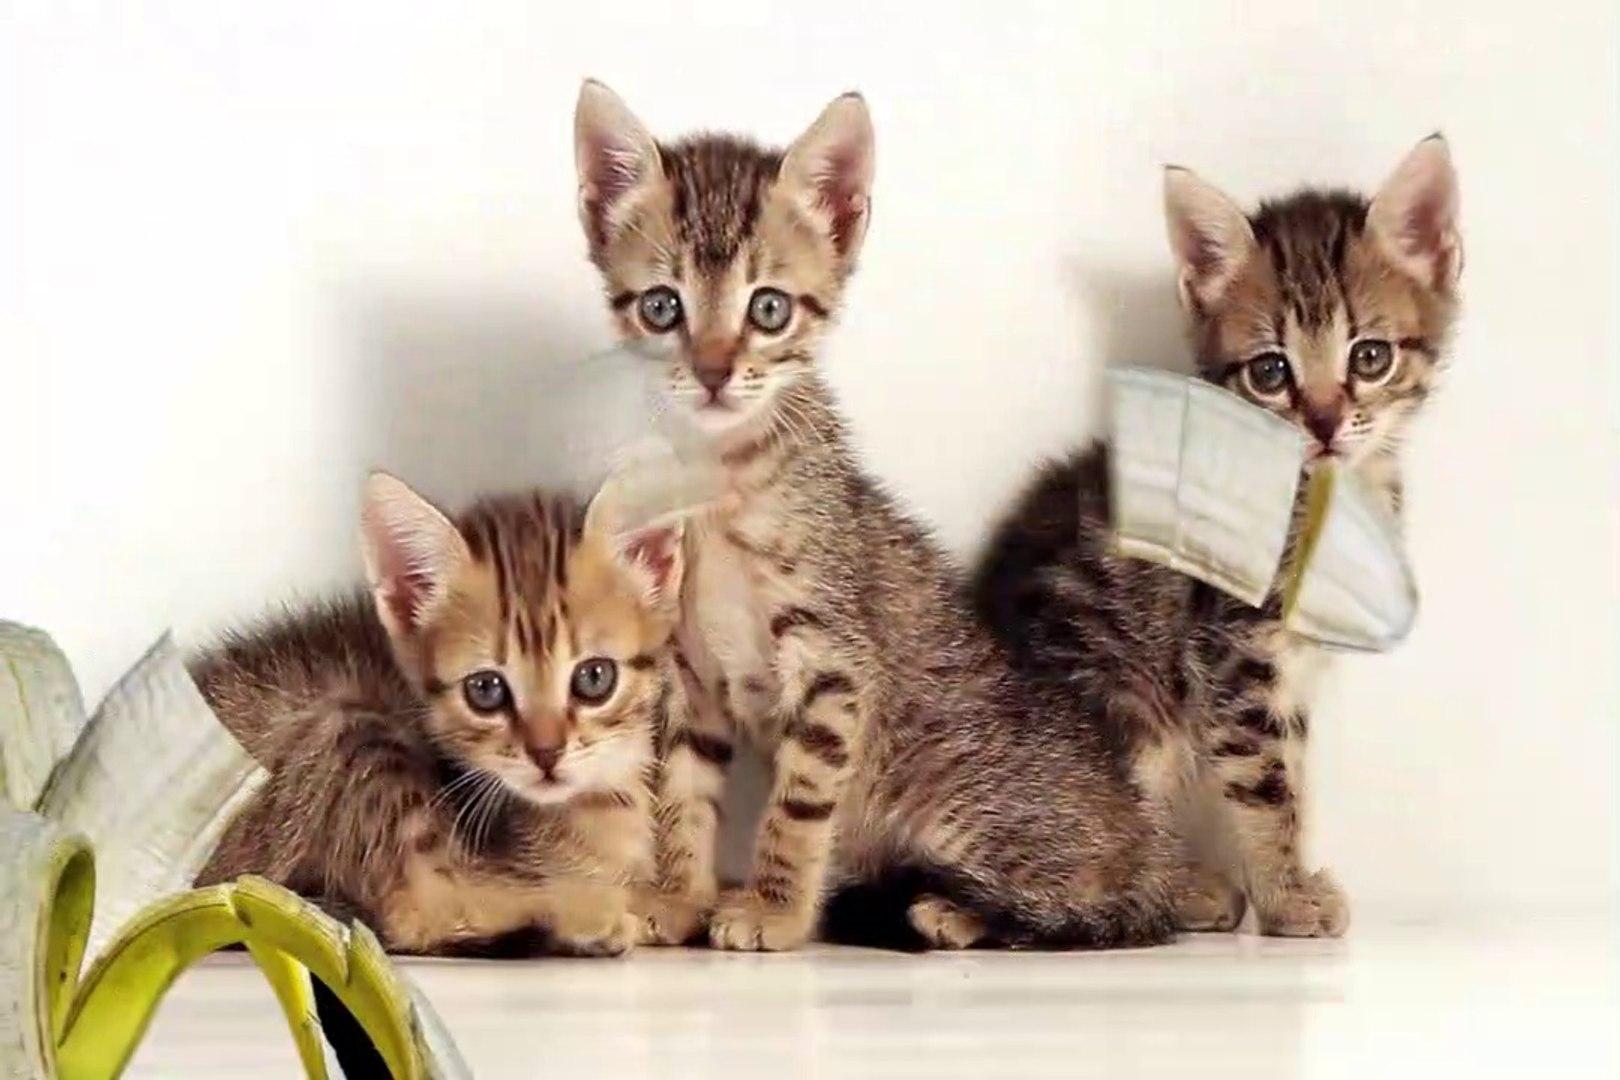 (NEW) | Cats are cute| cute cats | cute cat| cute cats videos| cats